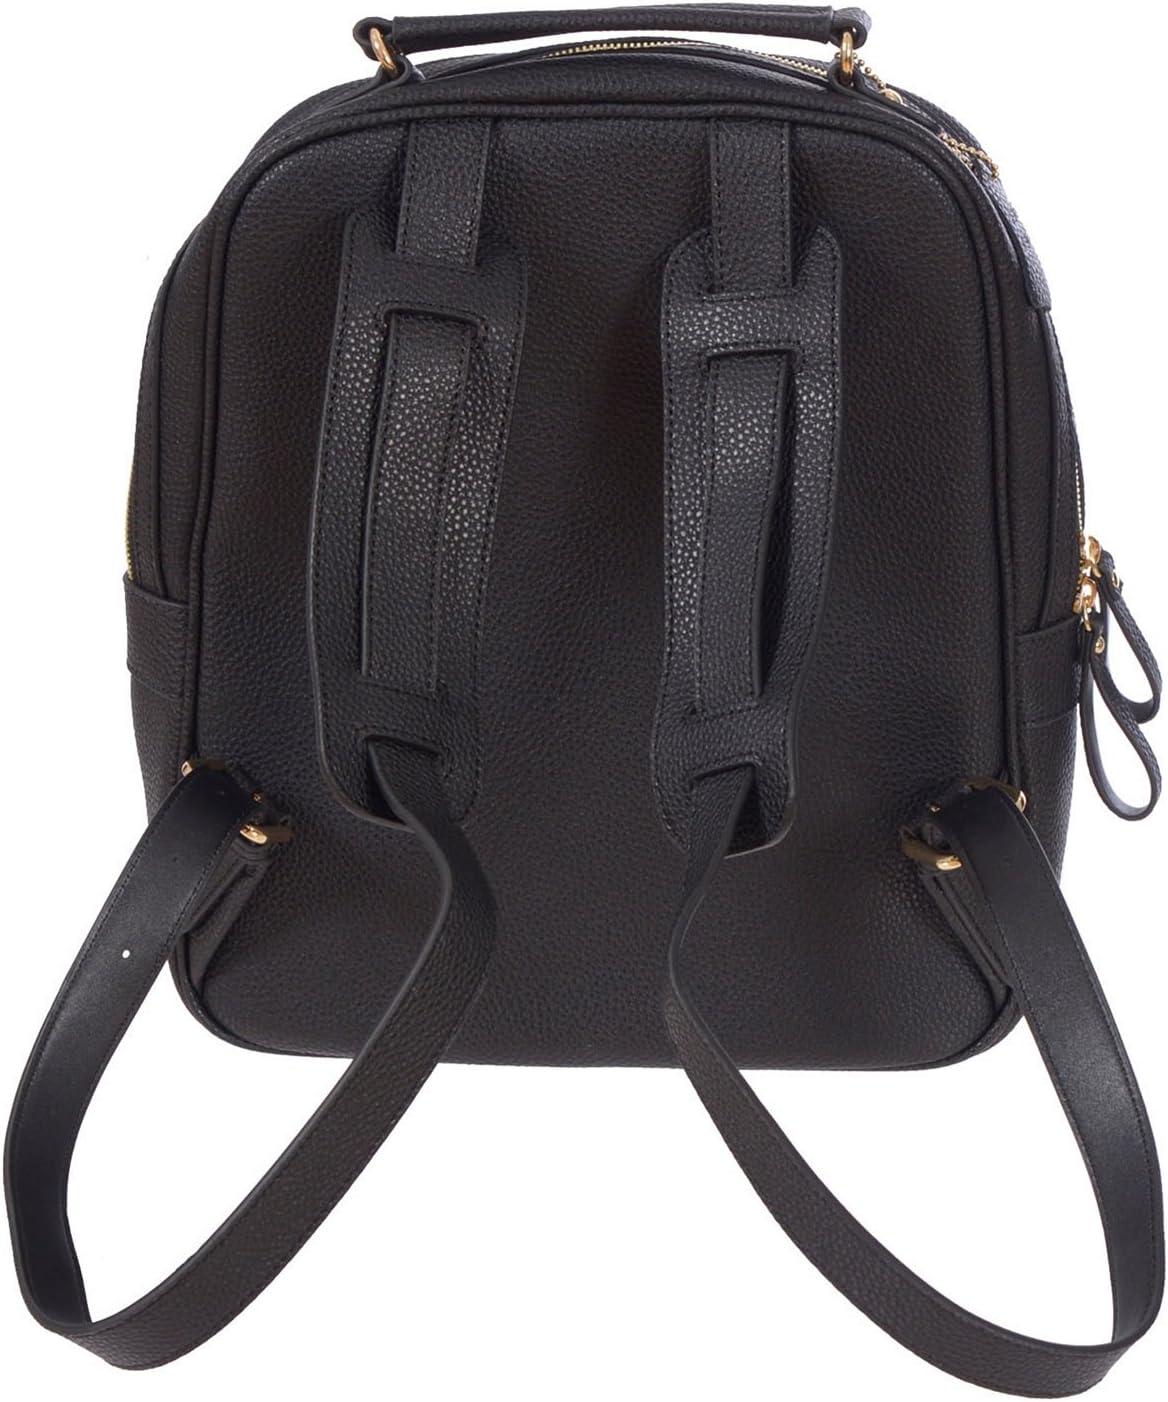 Renwick Leather Backpack Black